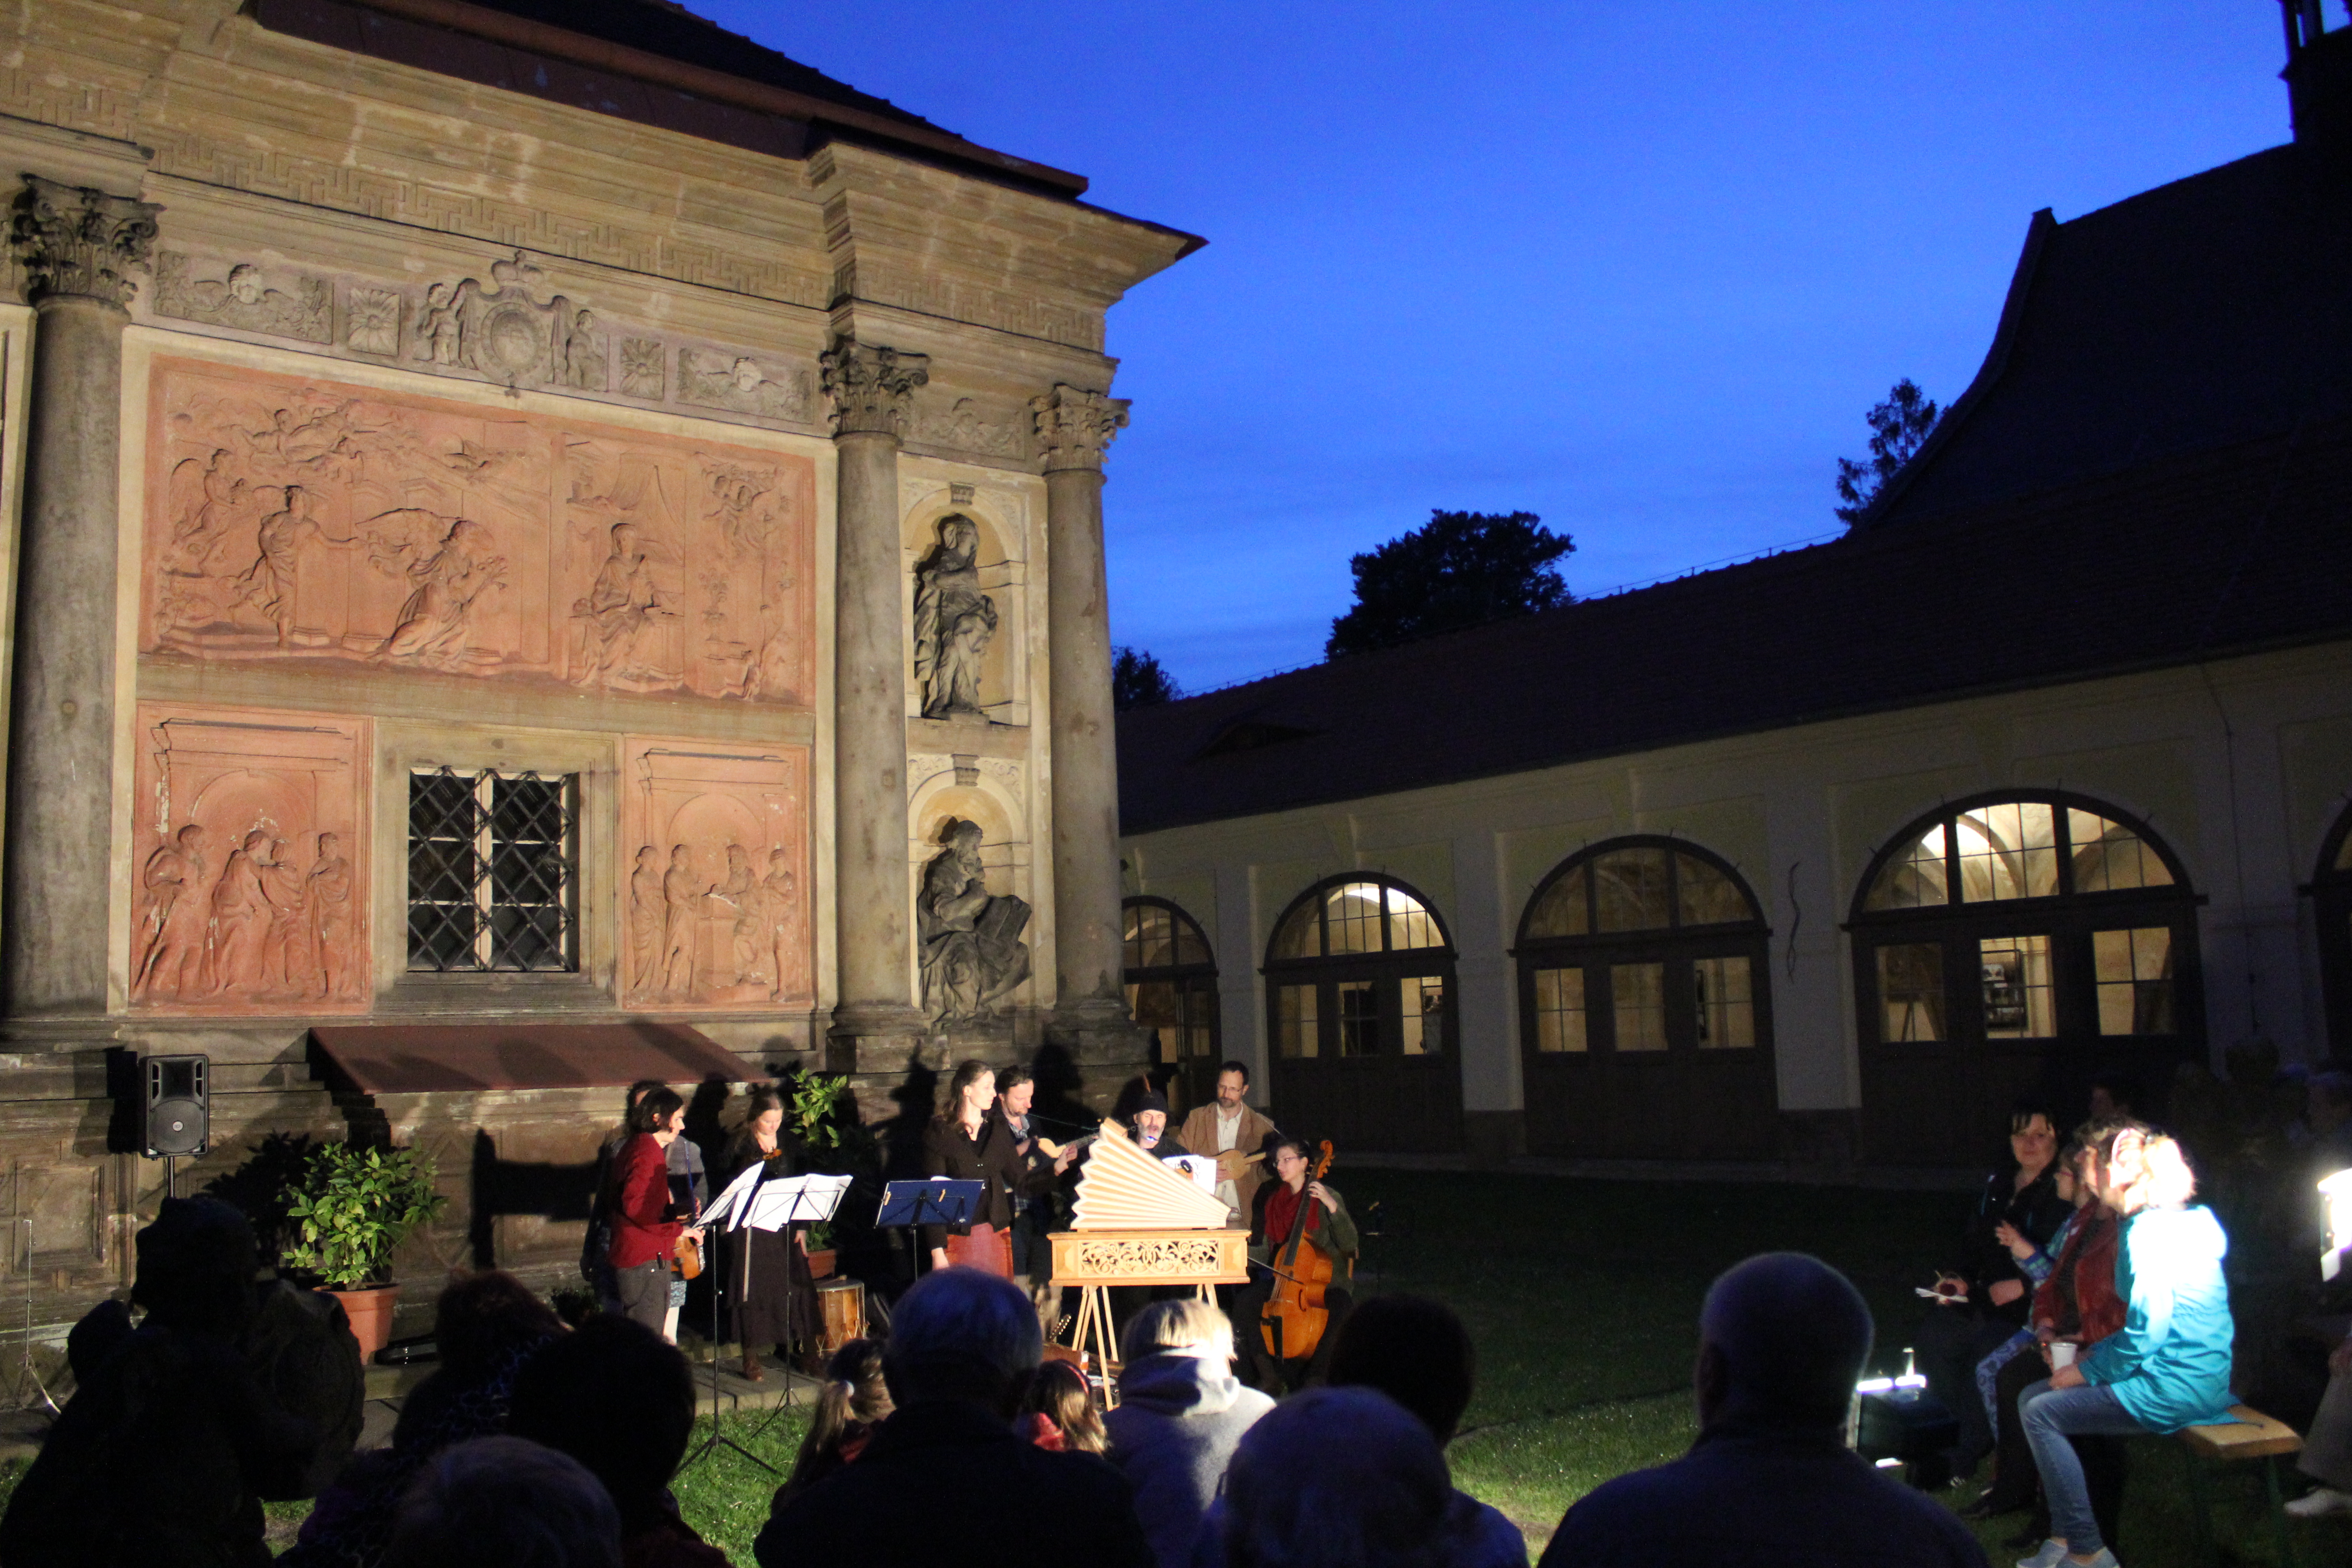 Loretánská-noc_Loretonacht-in-Rumburk3